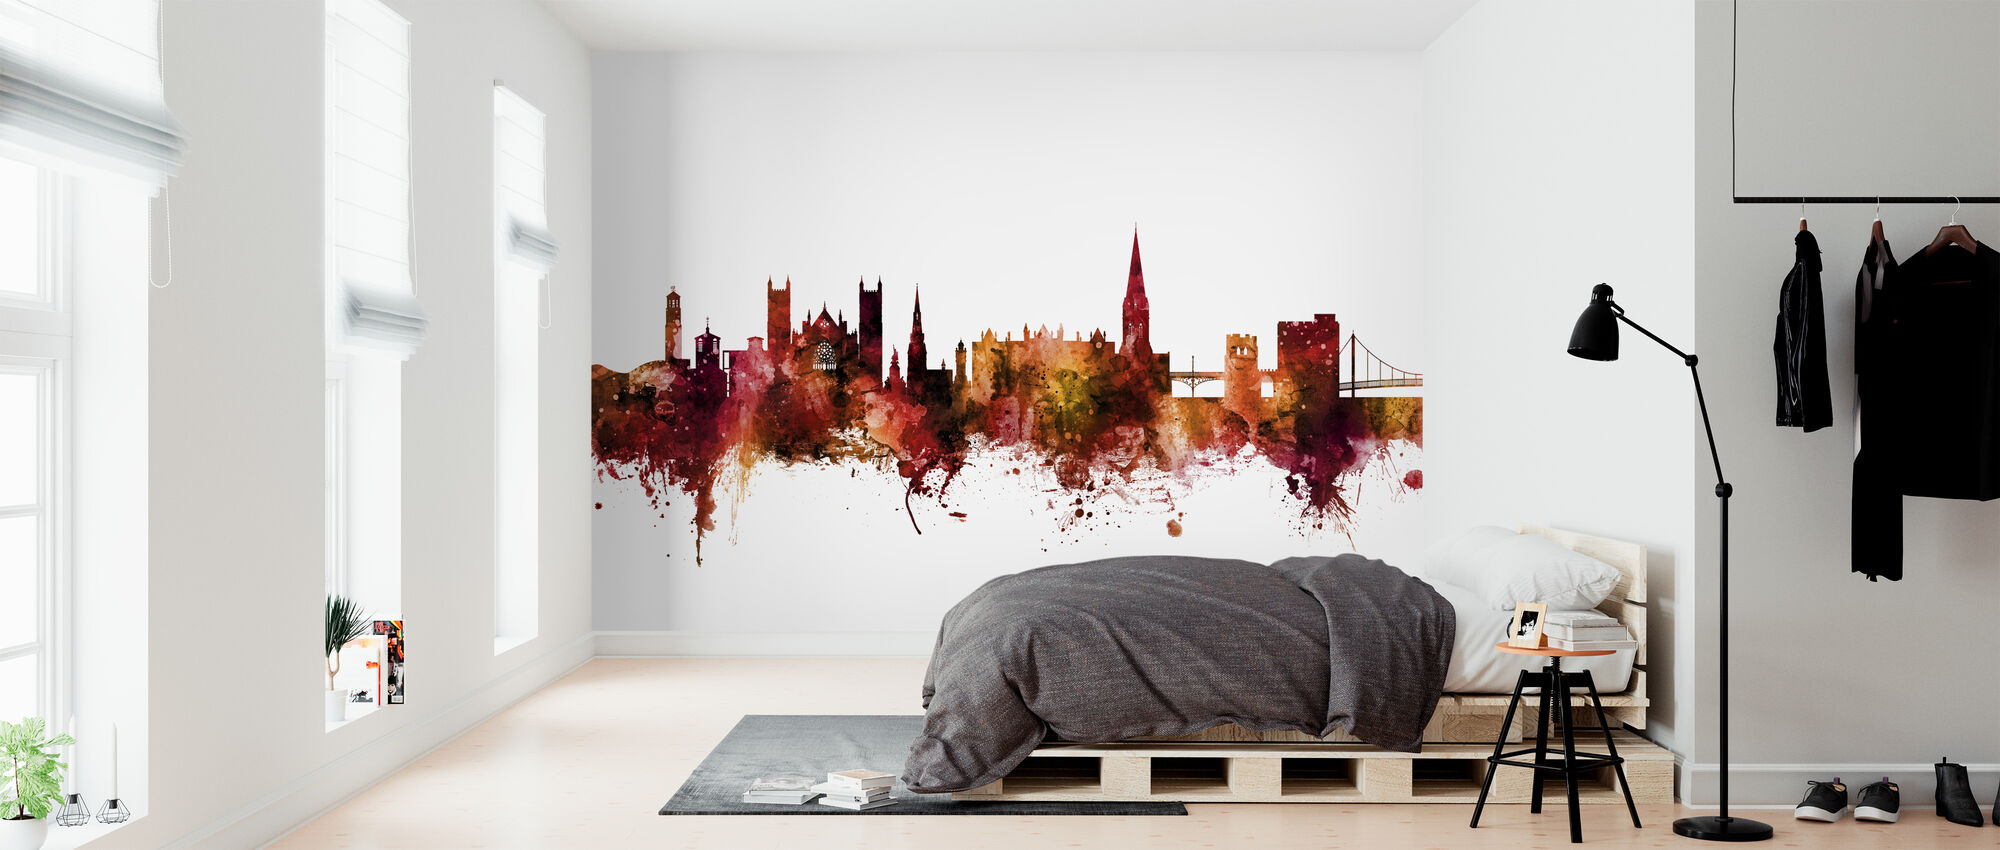 Exeter England Skyline - Wallpaper - Bedroom